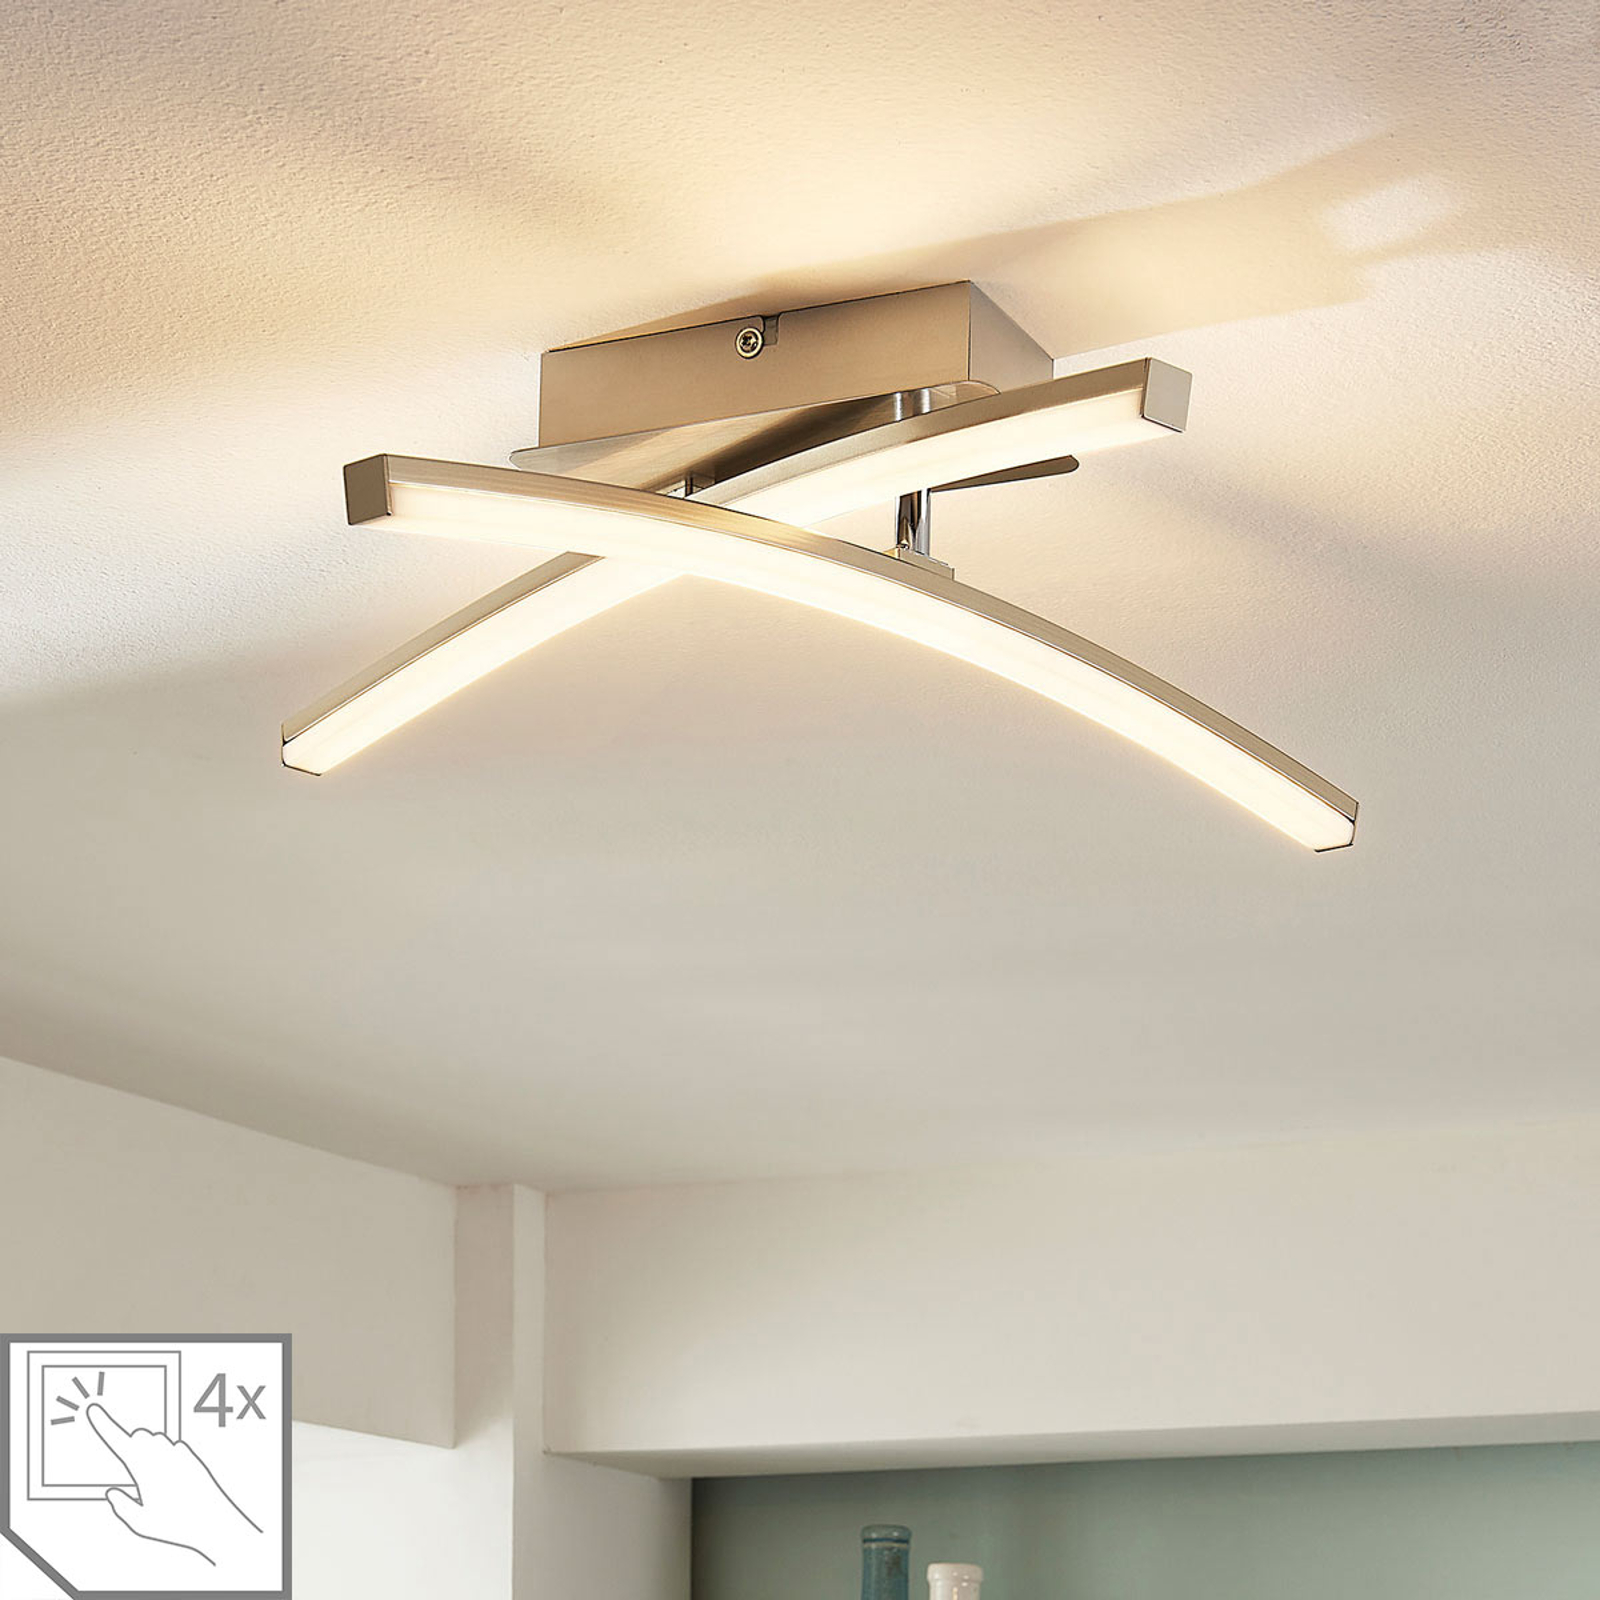 4-stufig dimmbare LED-Deckenlampe Laurenzia